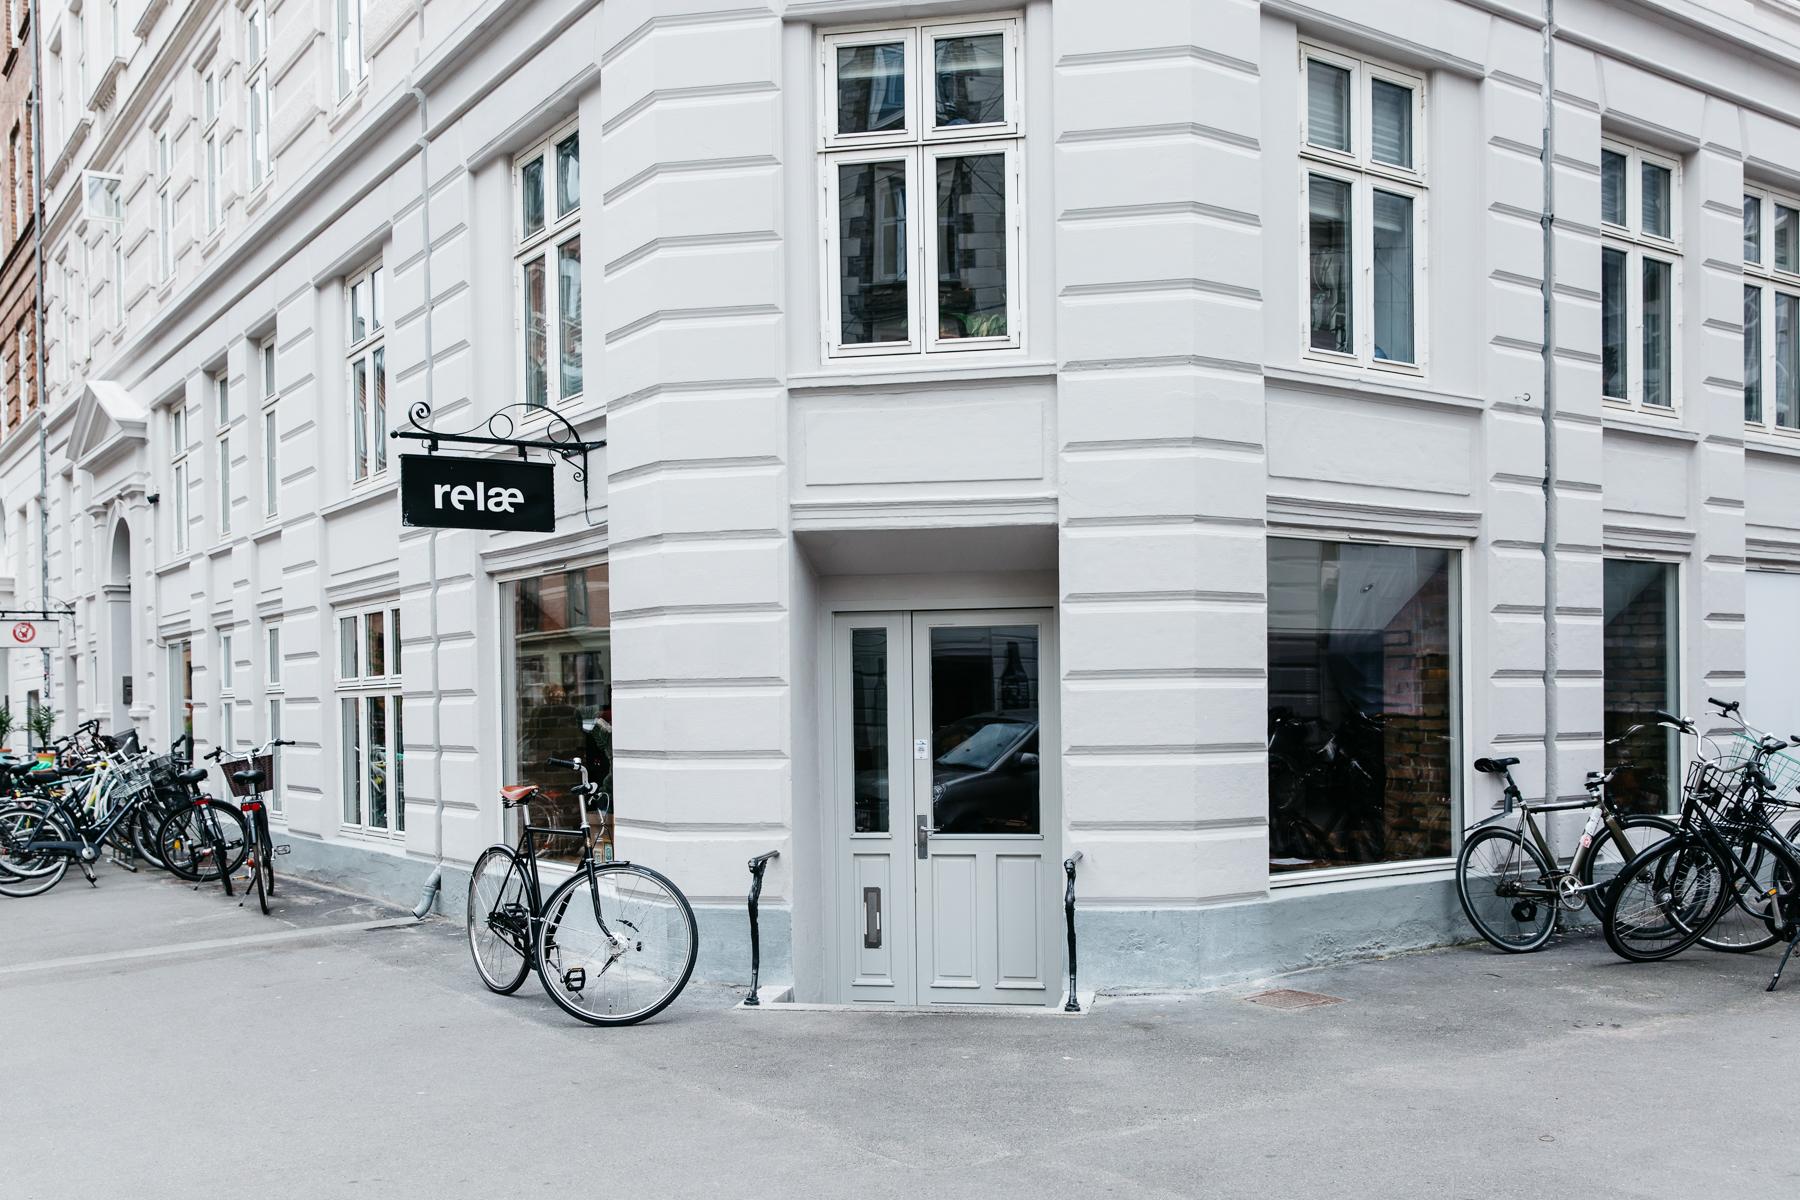 cph-Jægersborggade---5.jpg